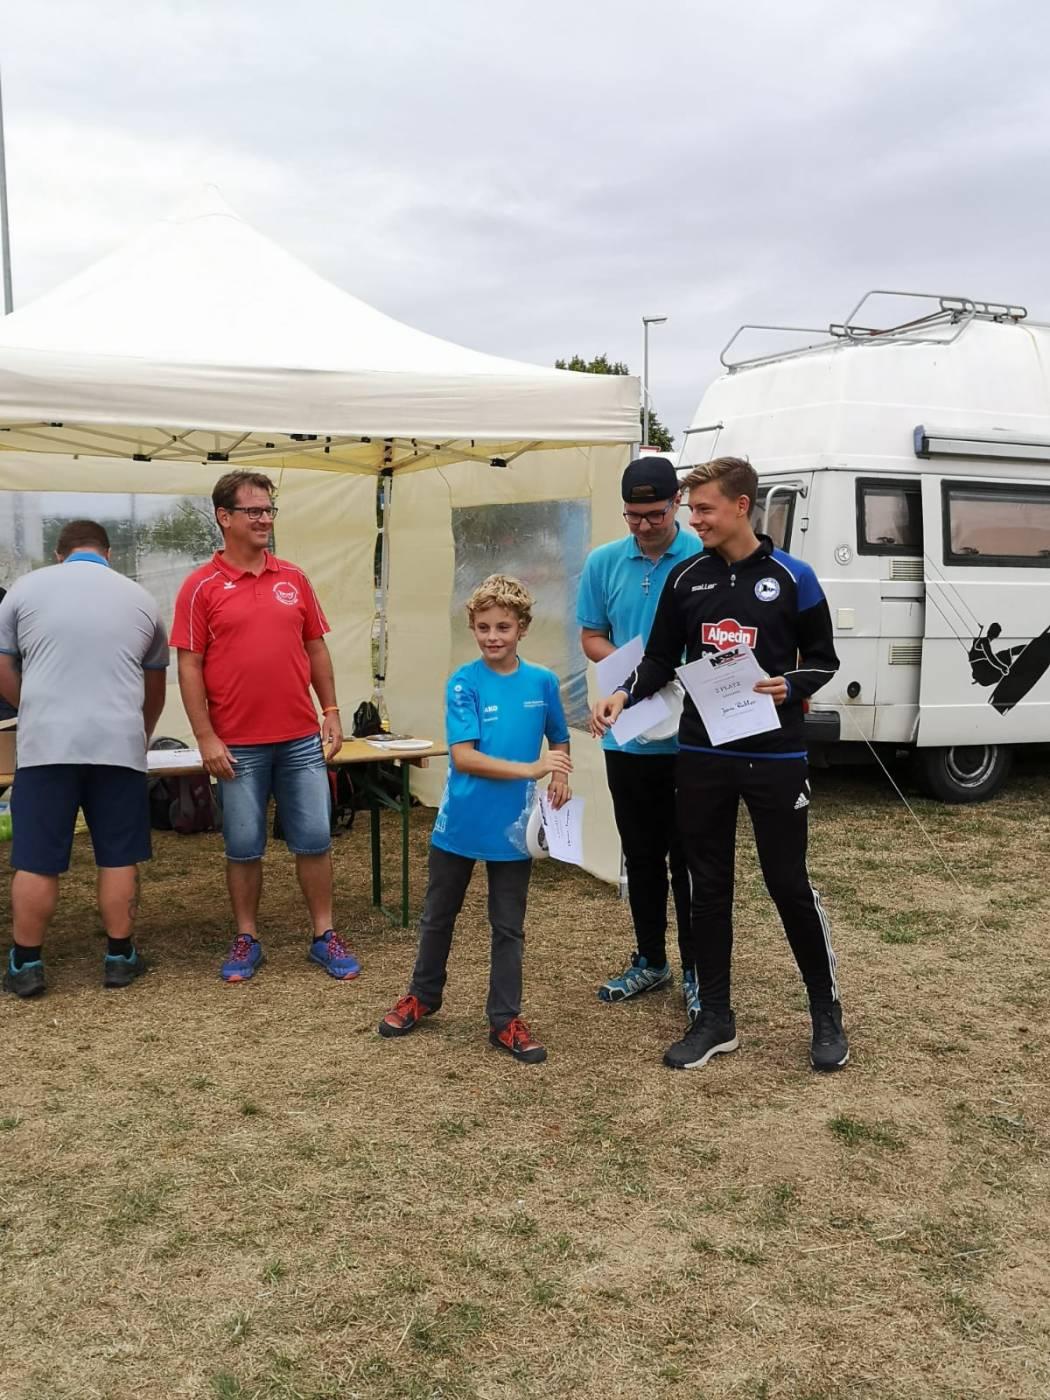 2018-09-02_NDS Landesmeisterschaft Discgolf Hannover 2018_037